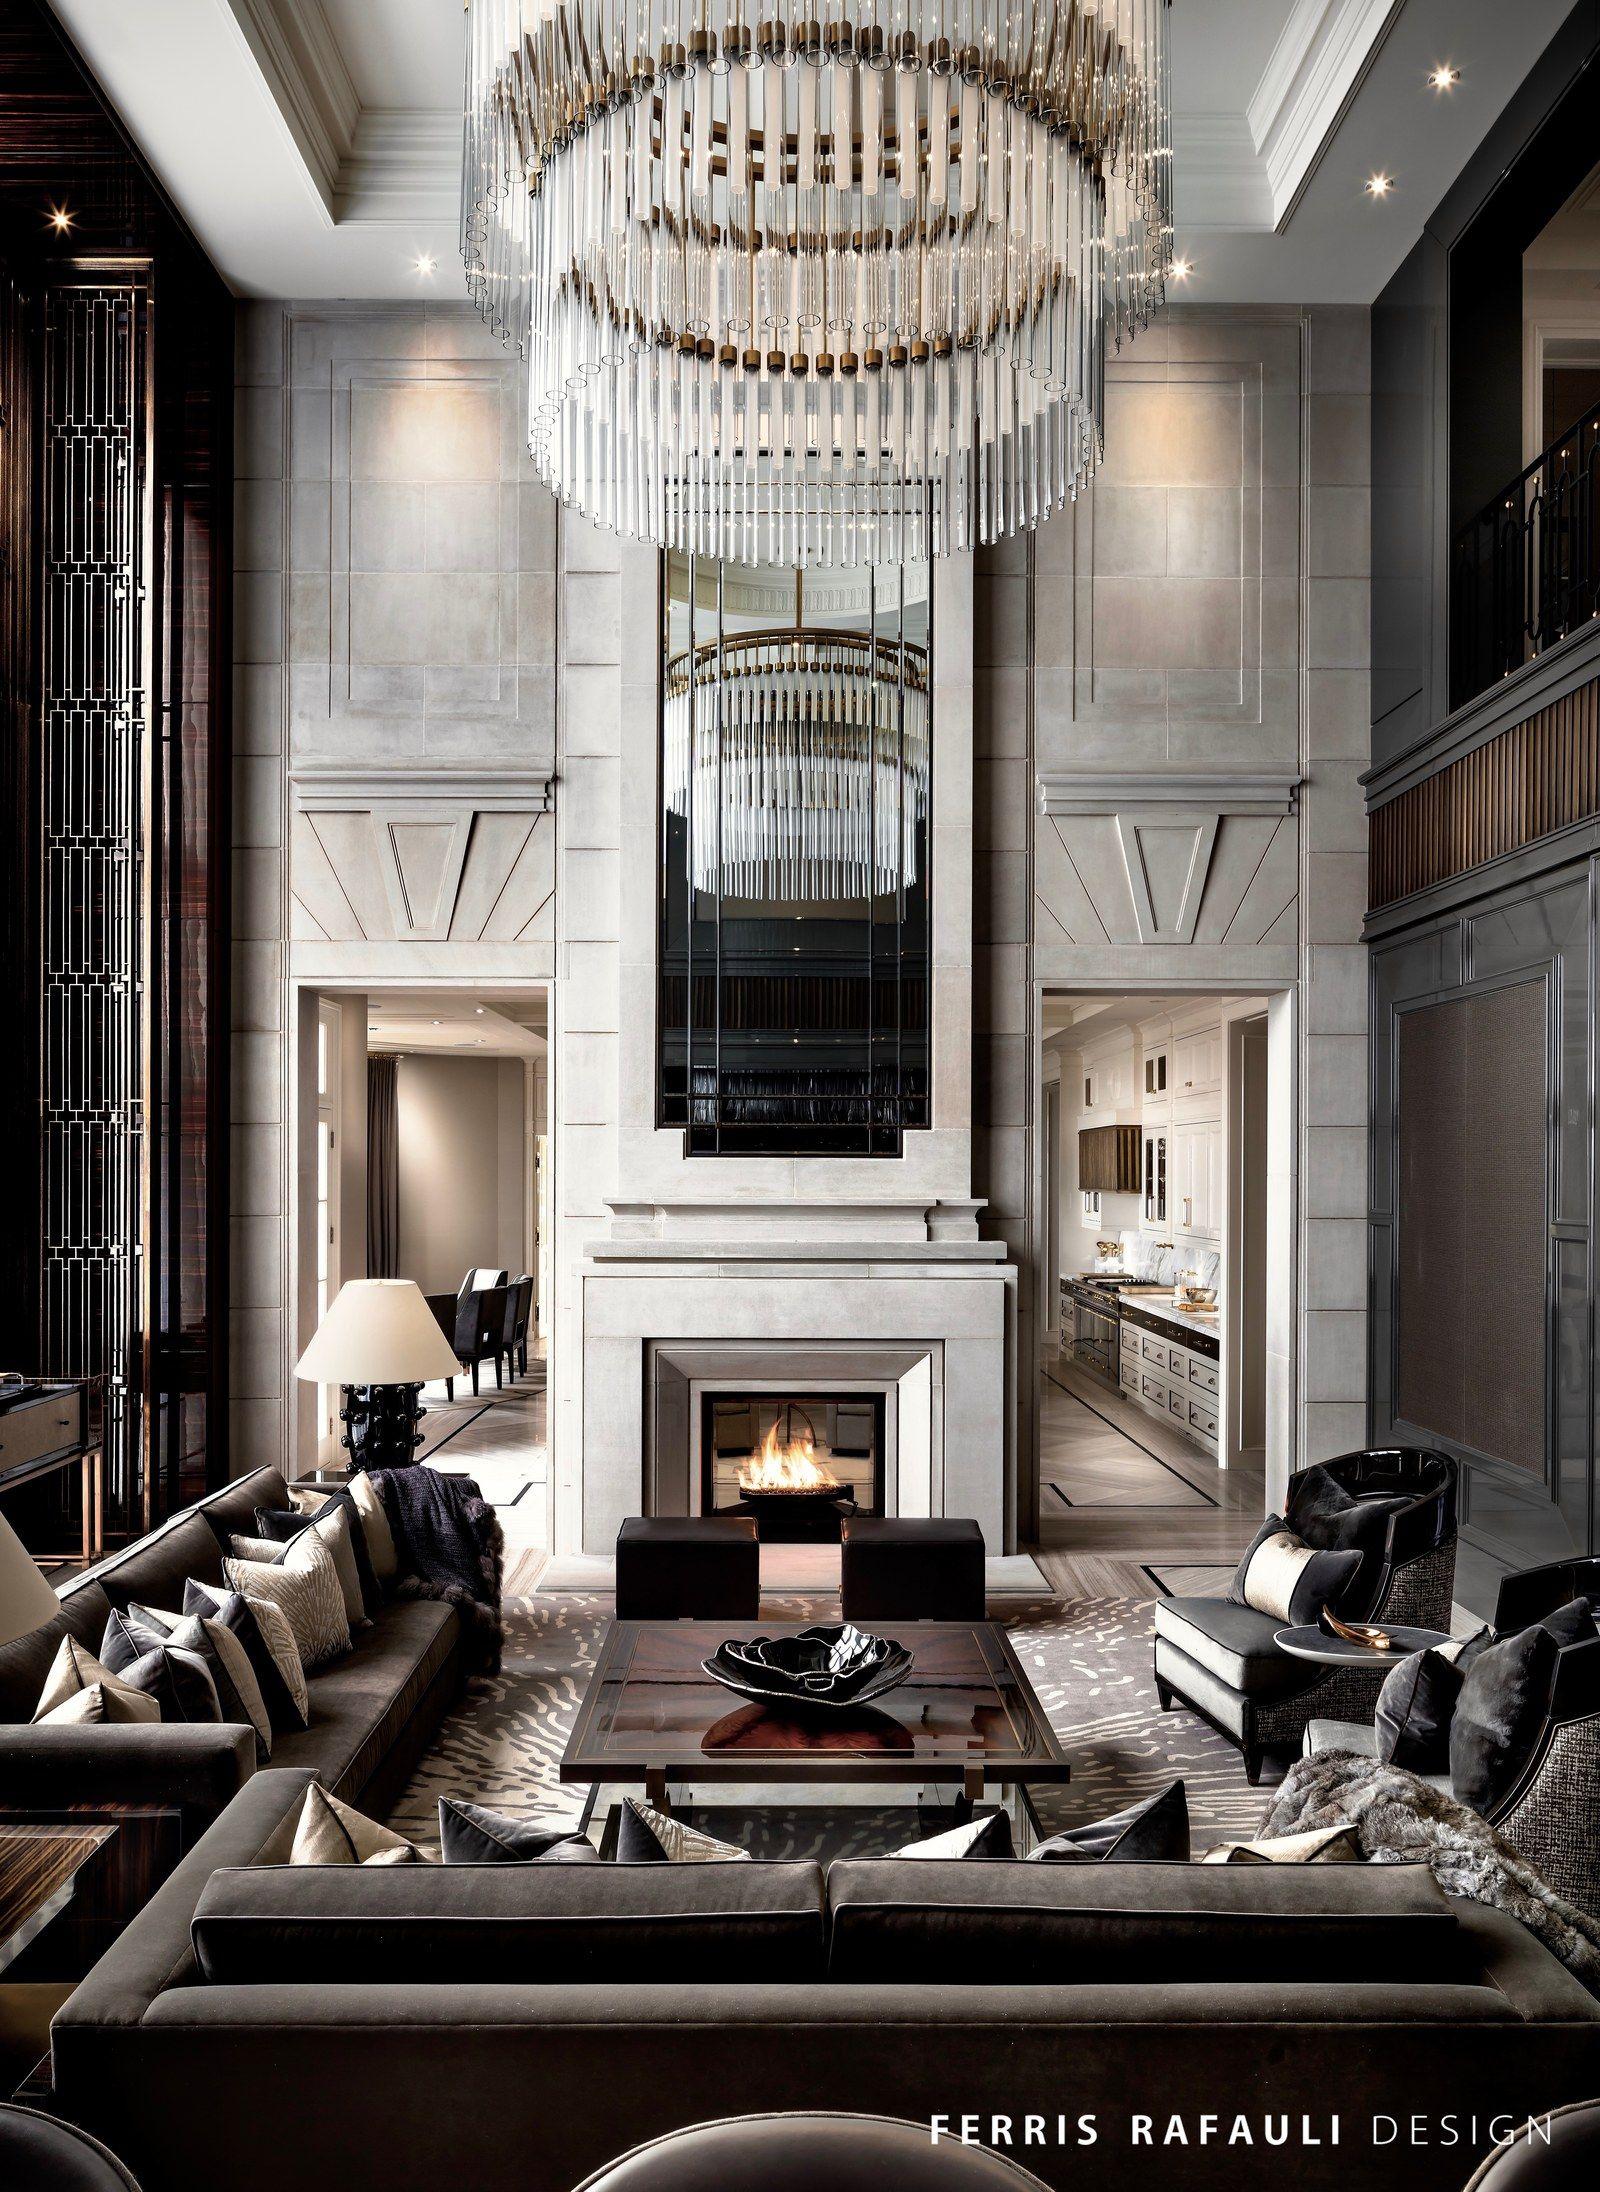 8 stunning interior design ideas that will enchant you on home interior design ideas id=20608